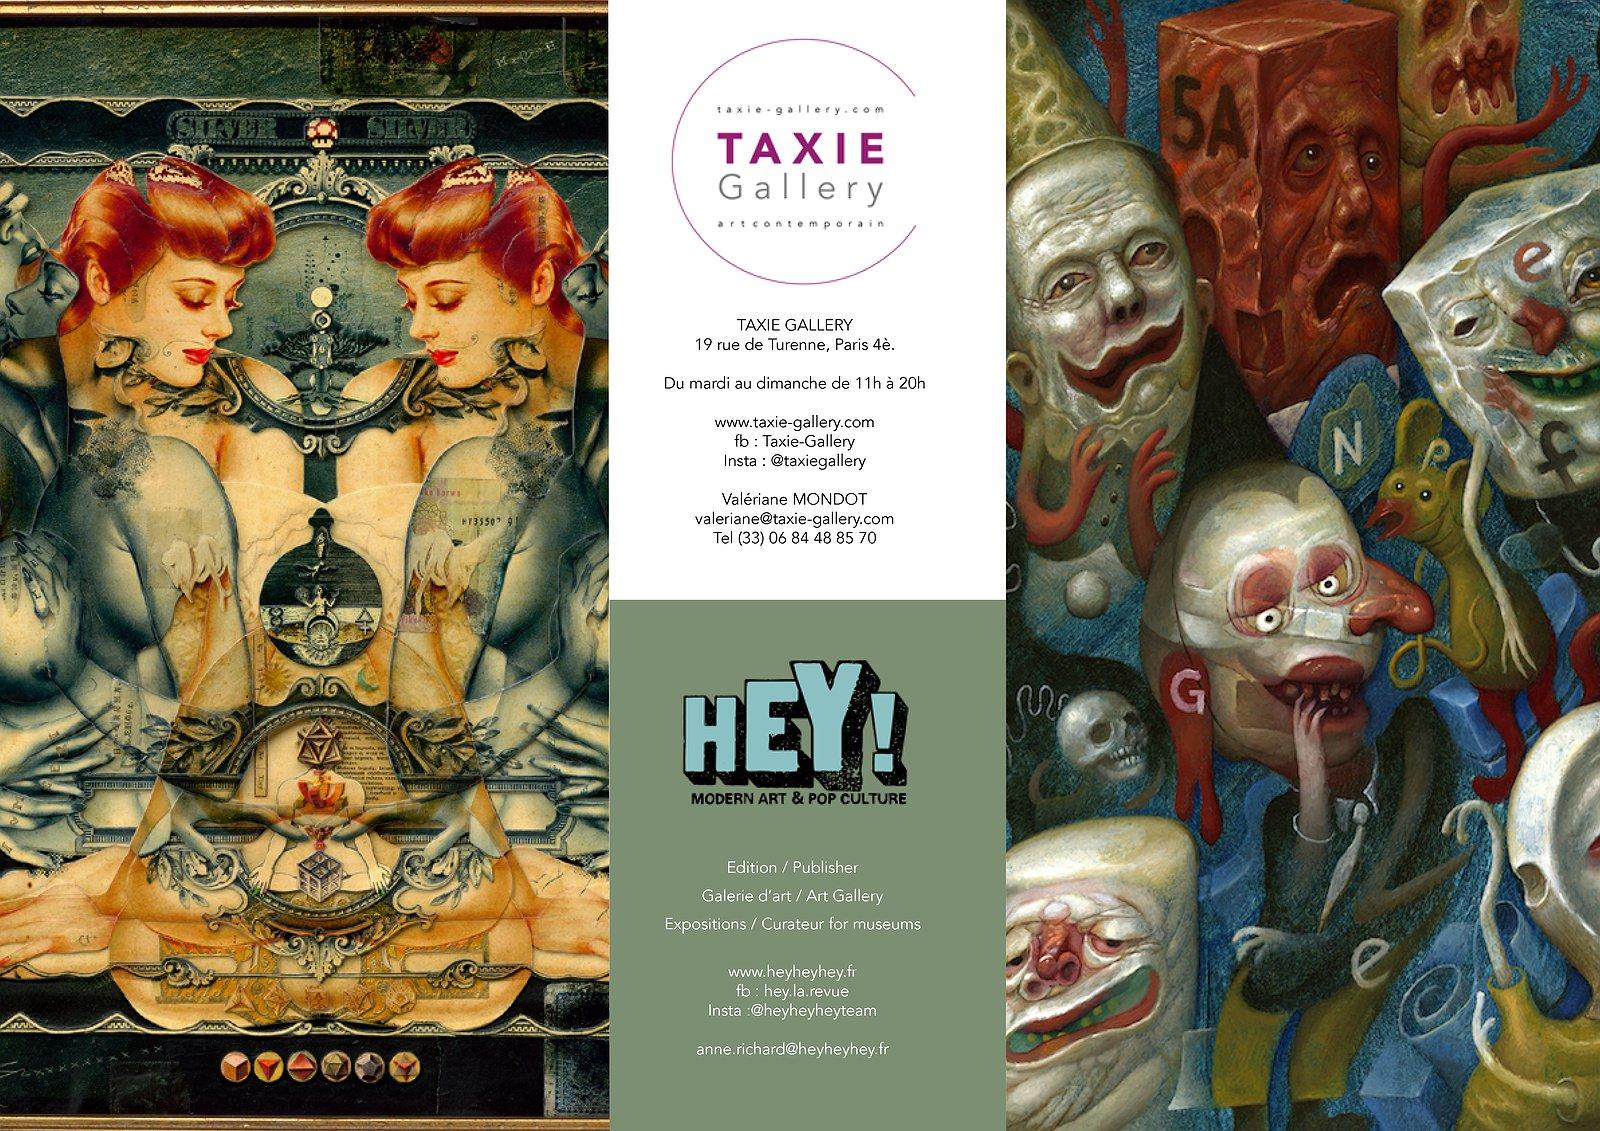 HEY! & Taxie Gallery présentent Handiedan & Chris Mars